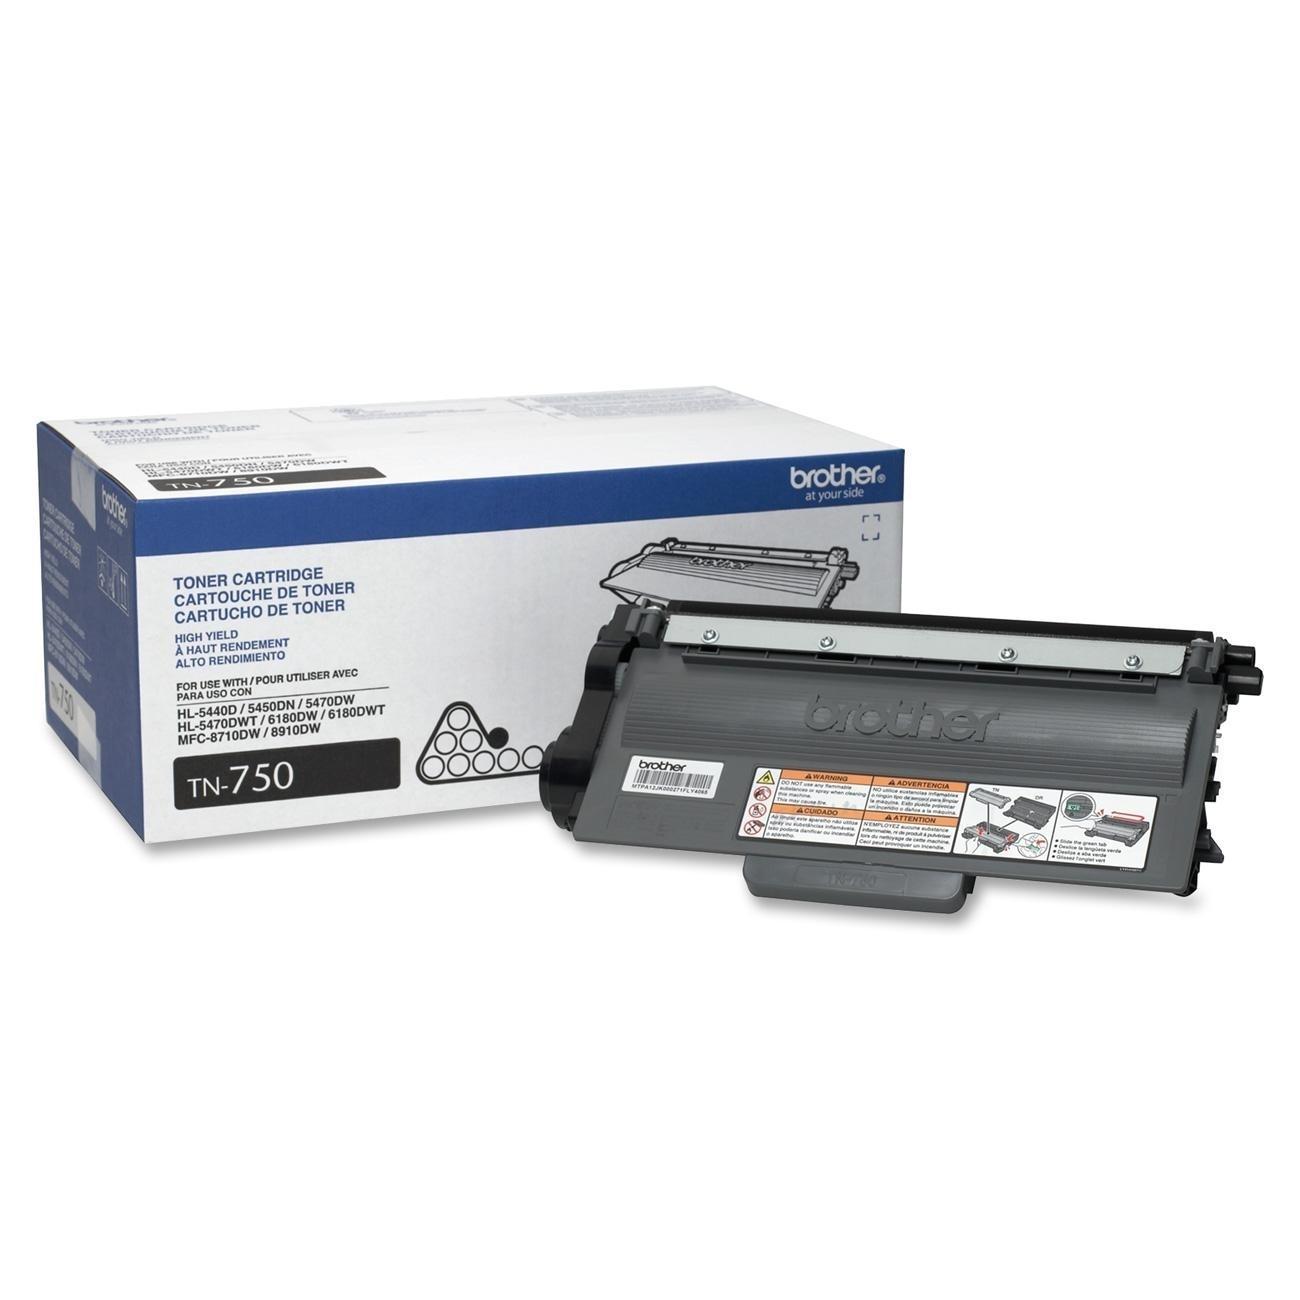 Brother TN750 OEM Black Toner Cartridge